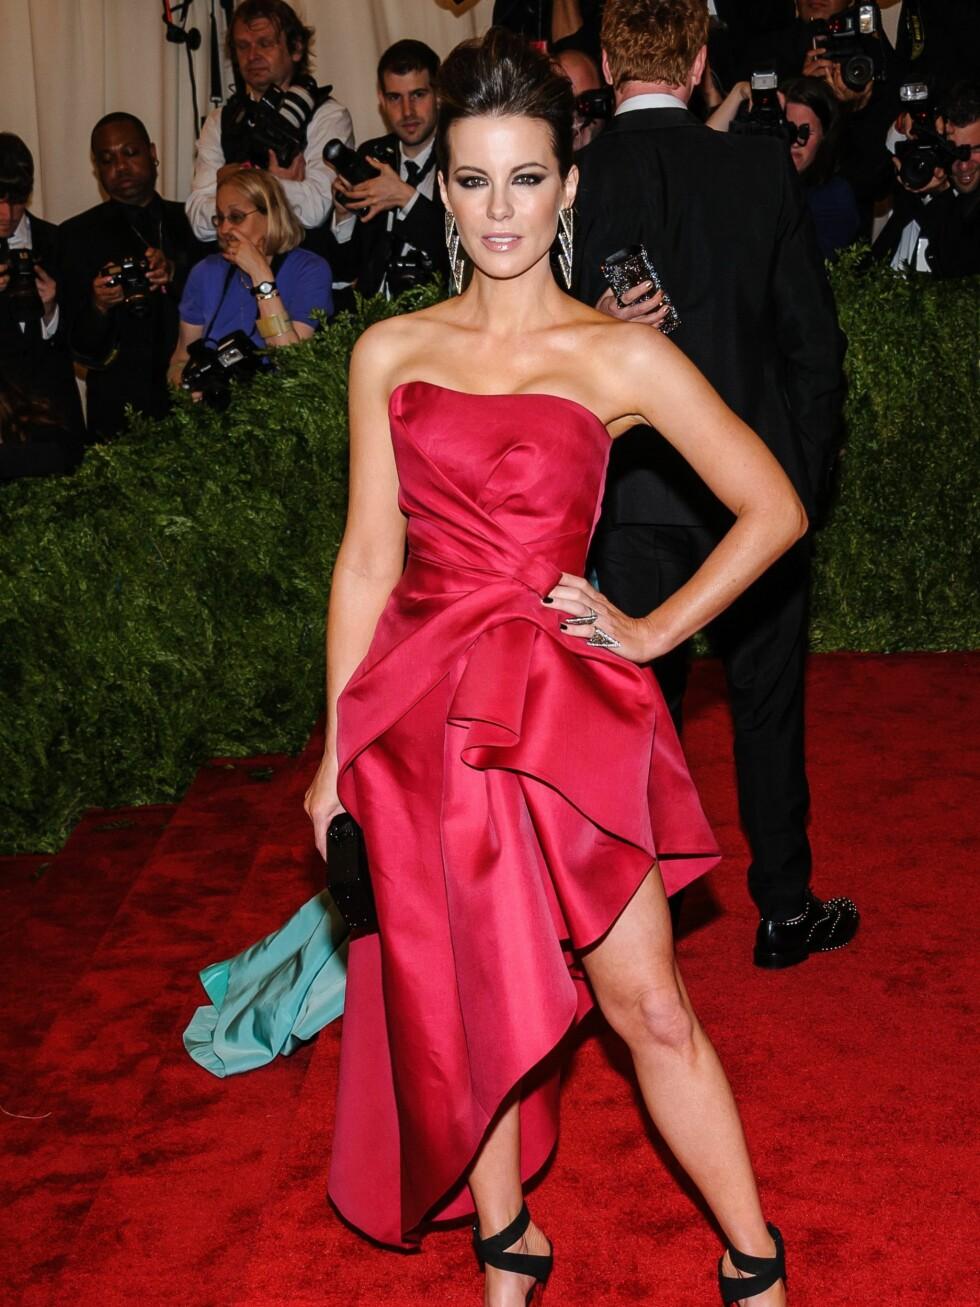 Kate Beckinsale Foto: All Over Press